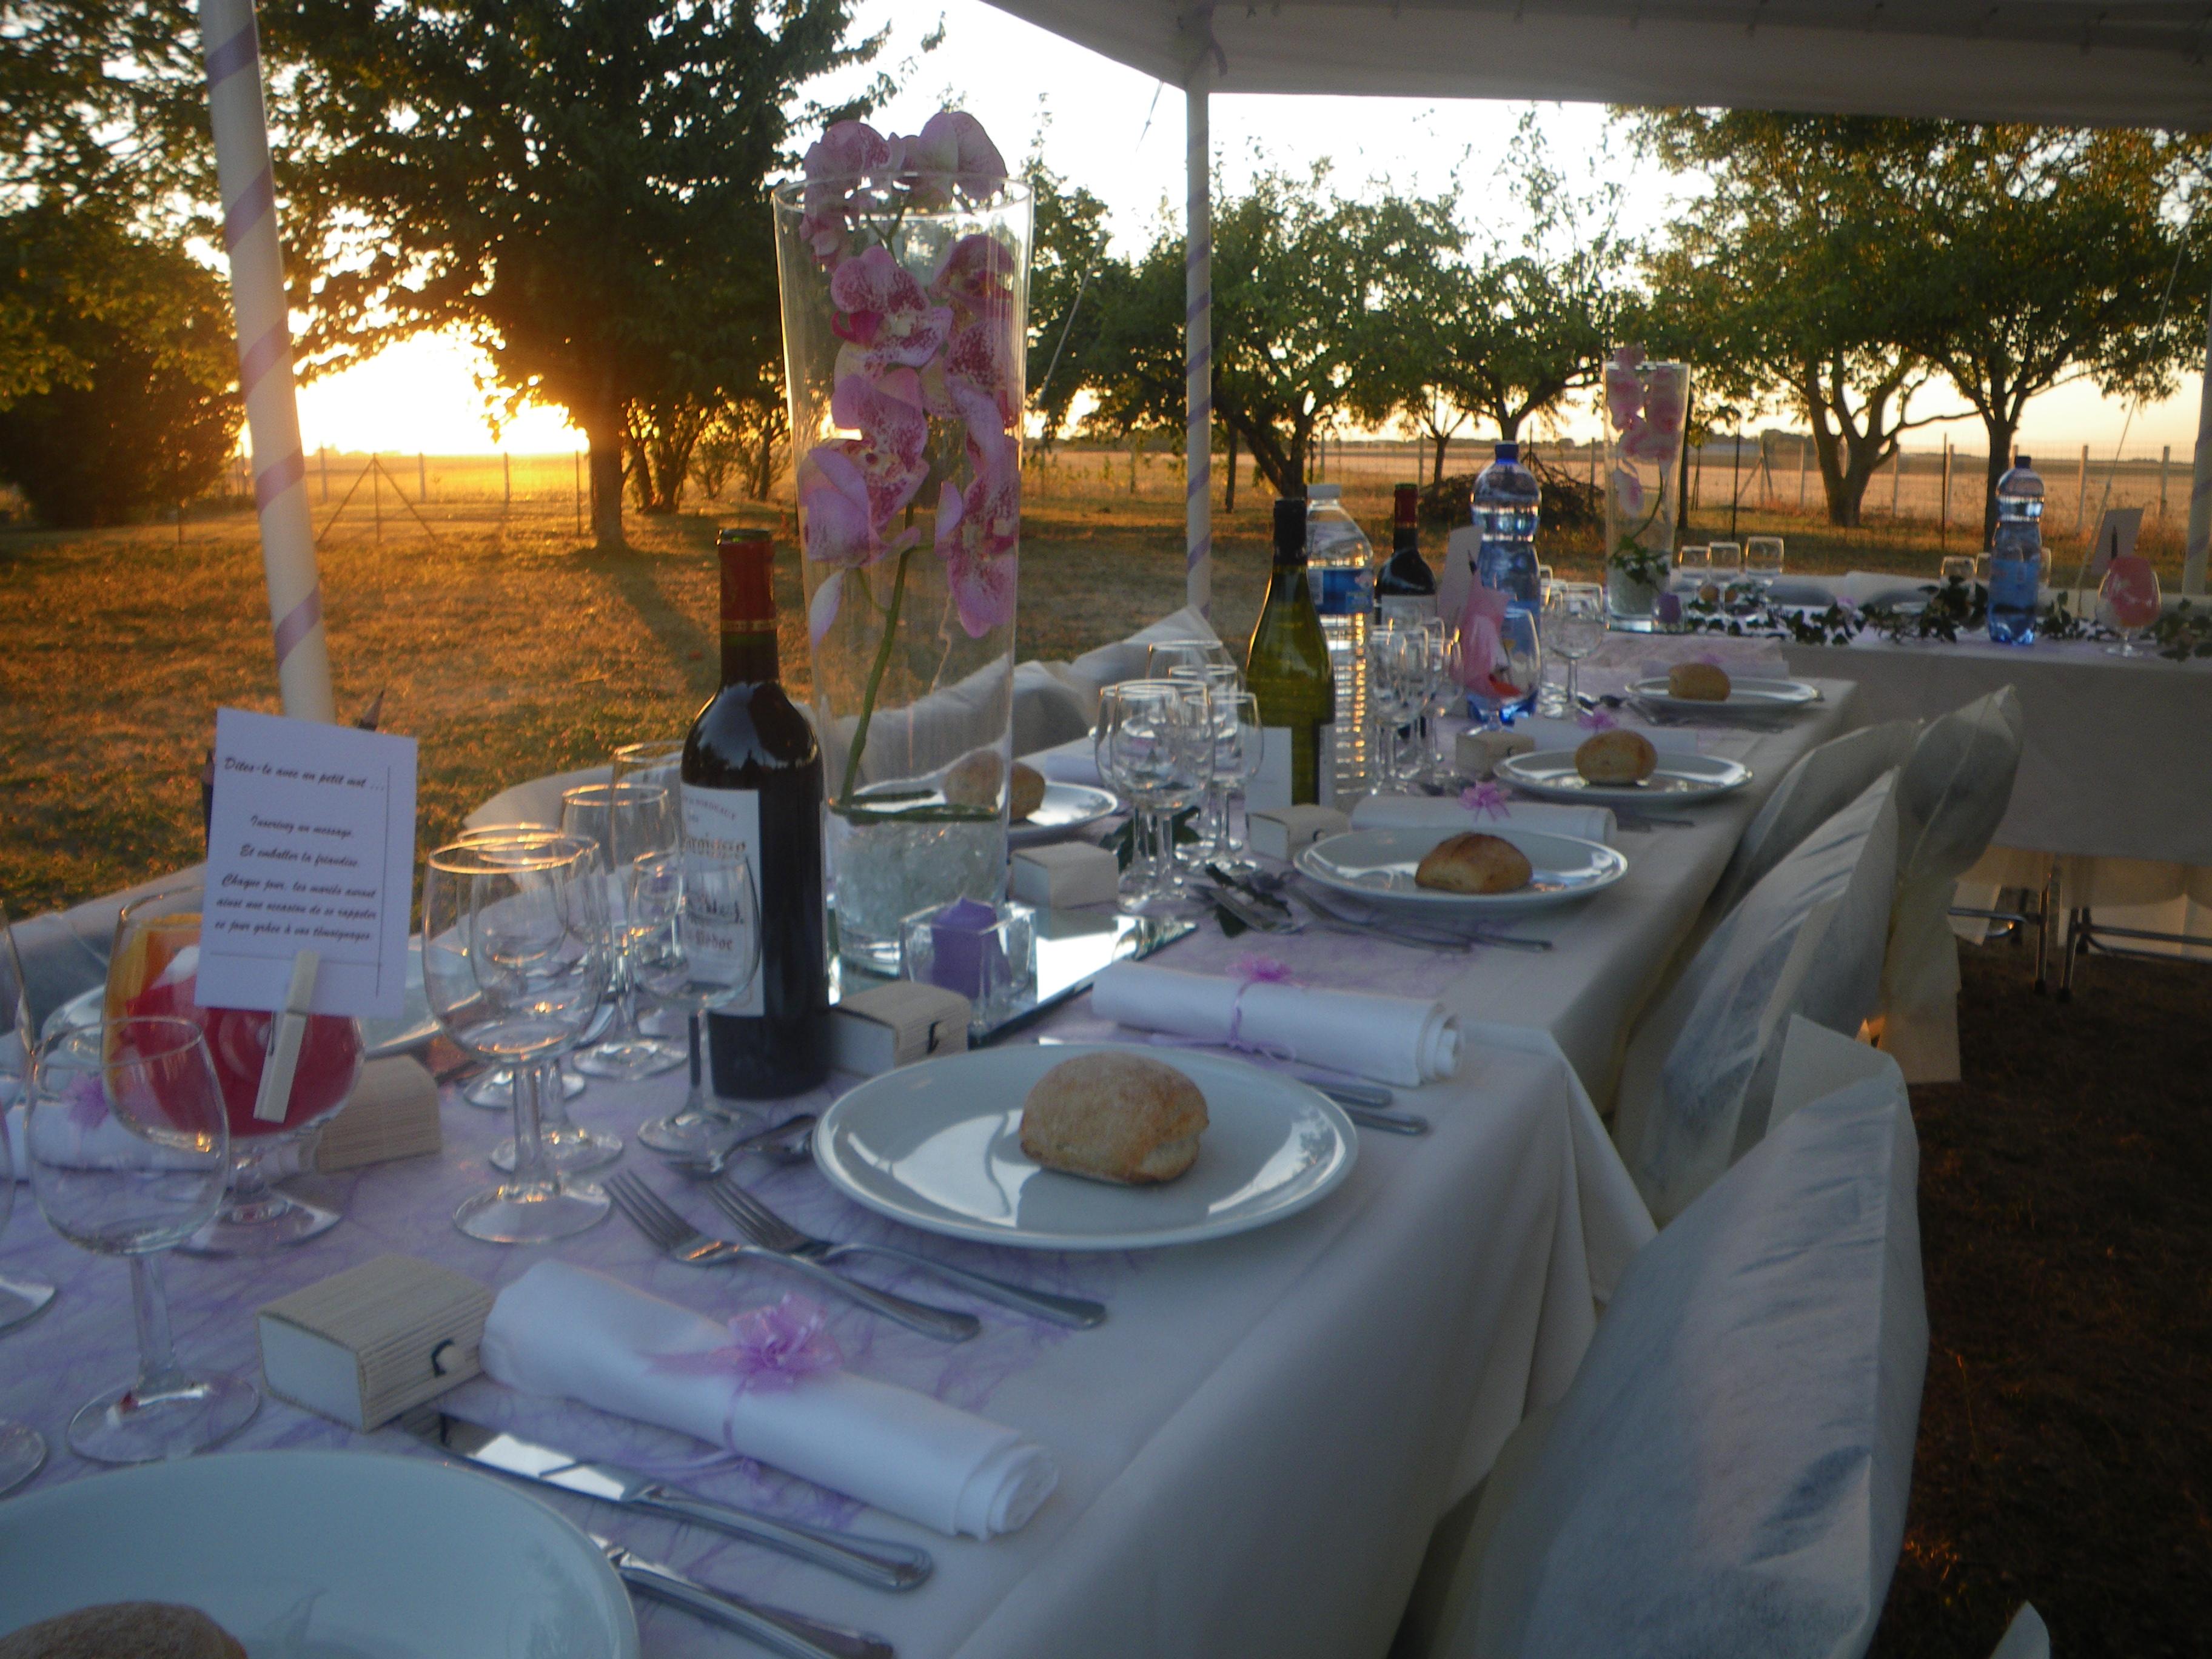 rikila-events-paris-location-table6